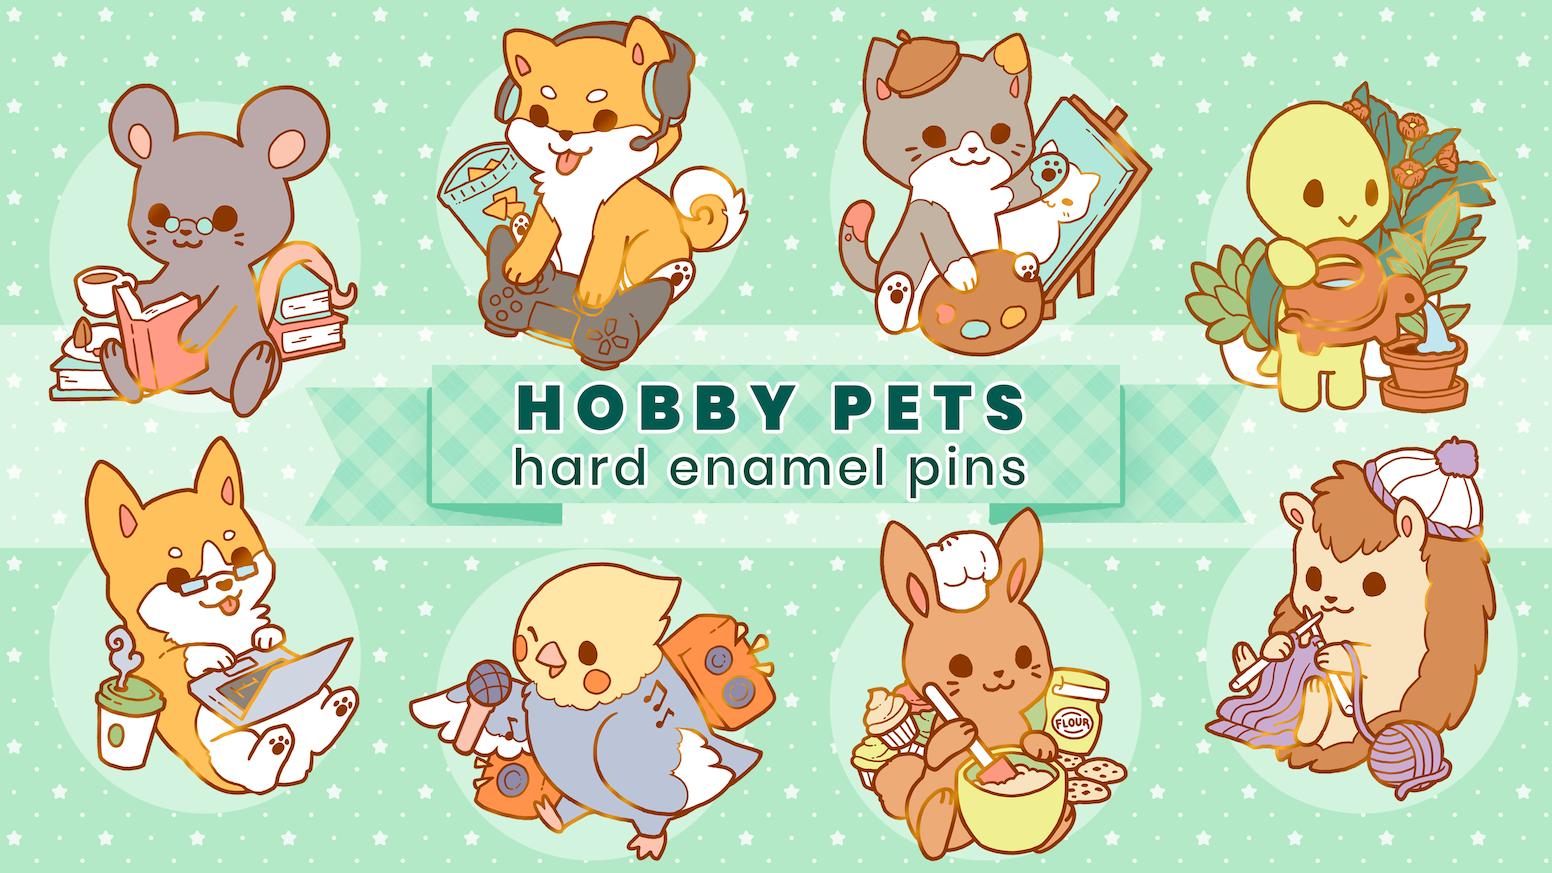 HOBBY PETS ☆ Hard Enamel Pins by lemoncreamsicle — Kickstarter